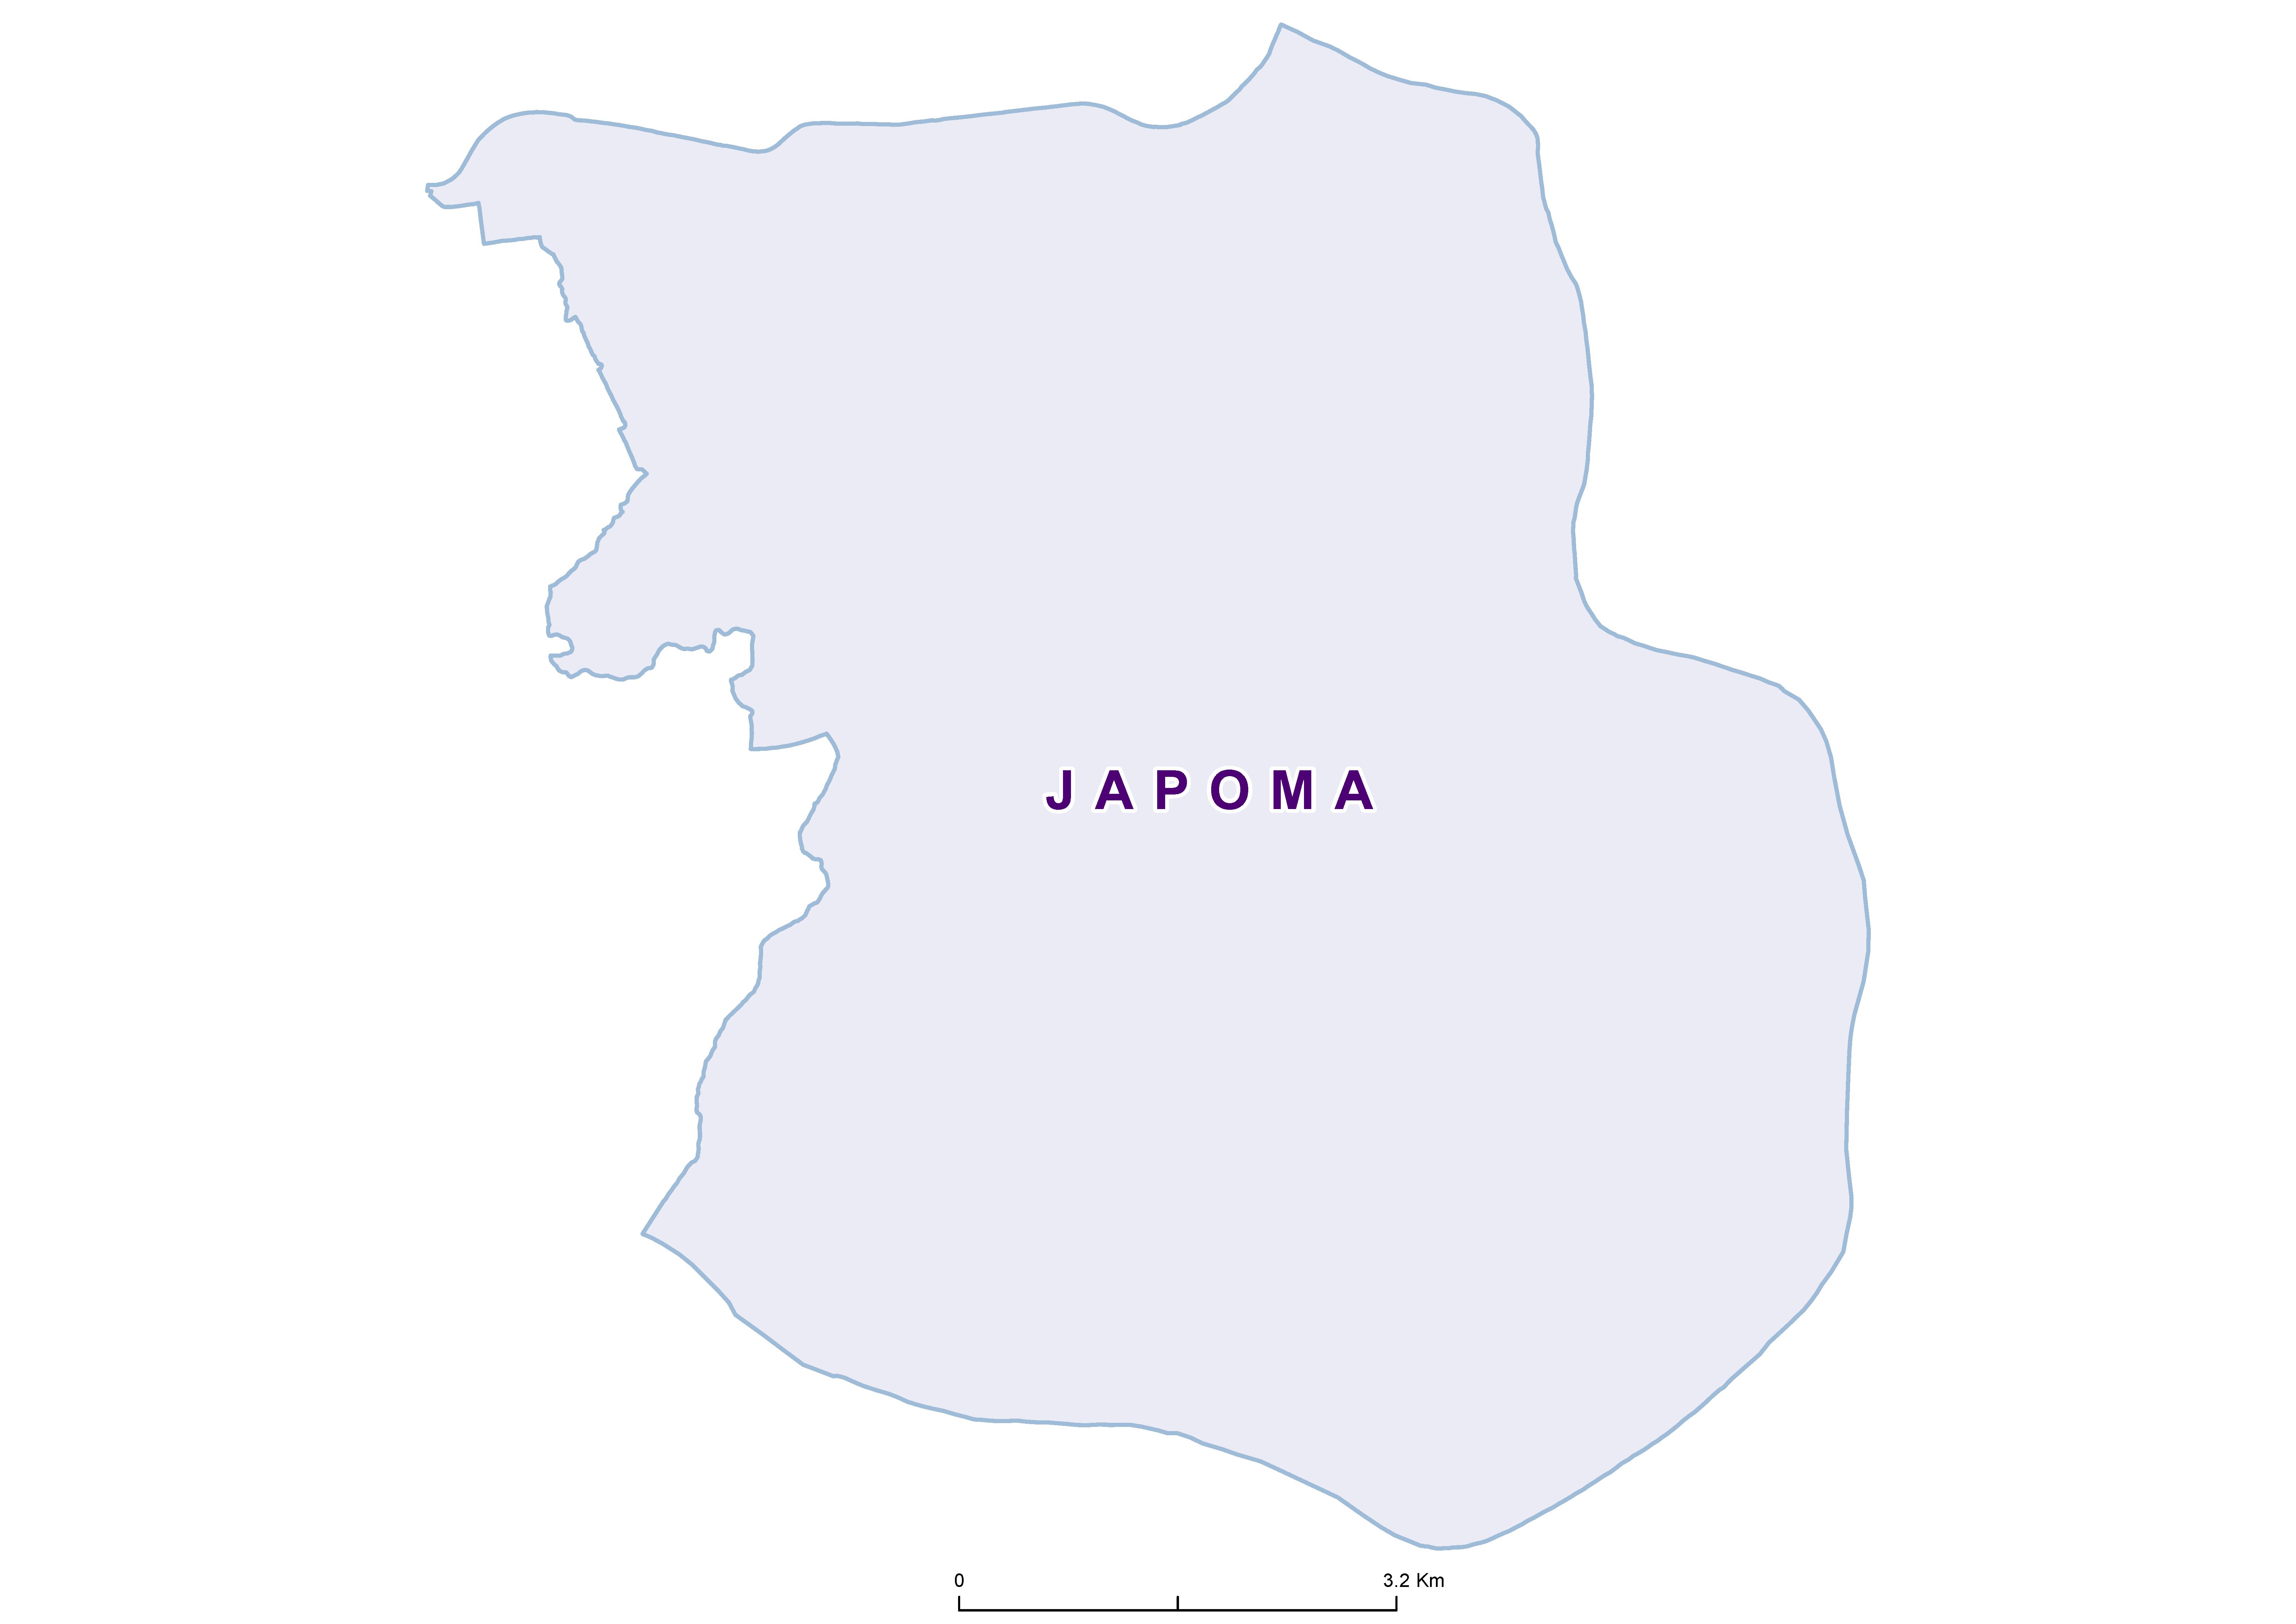 Japoma Max STH 20100001